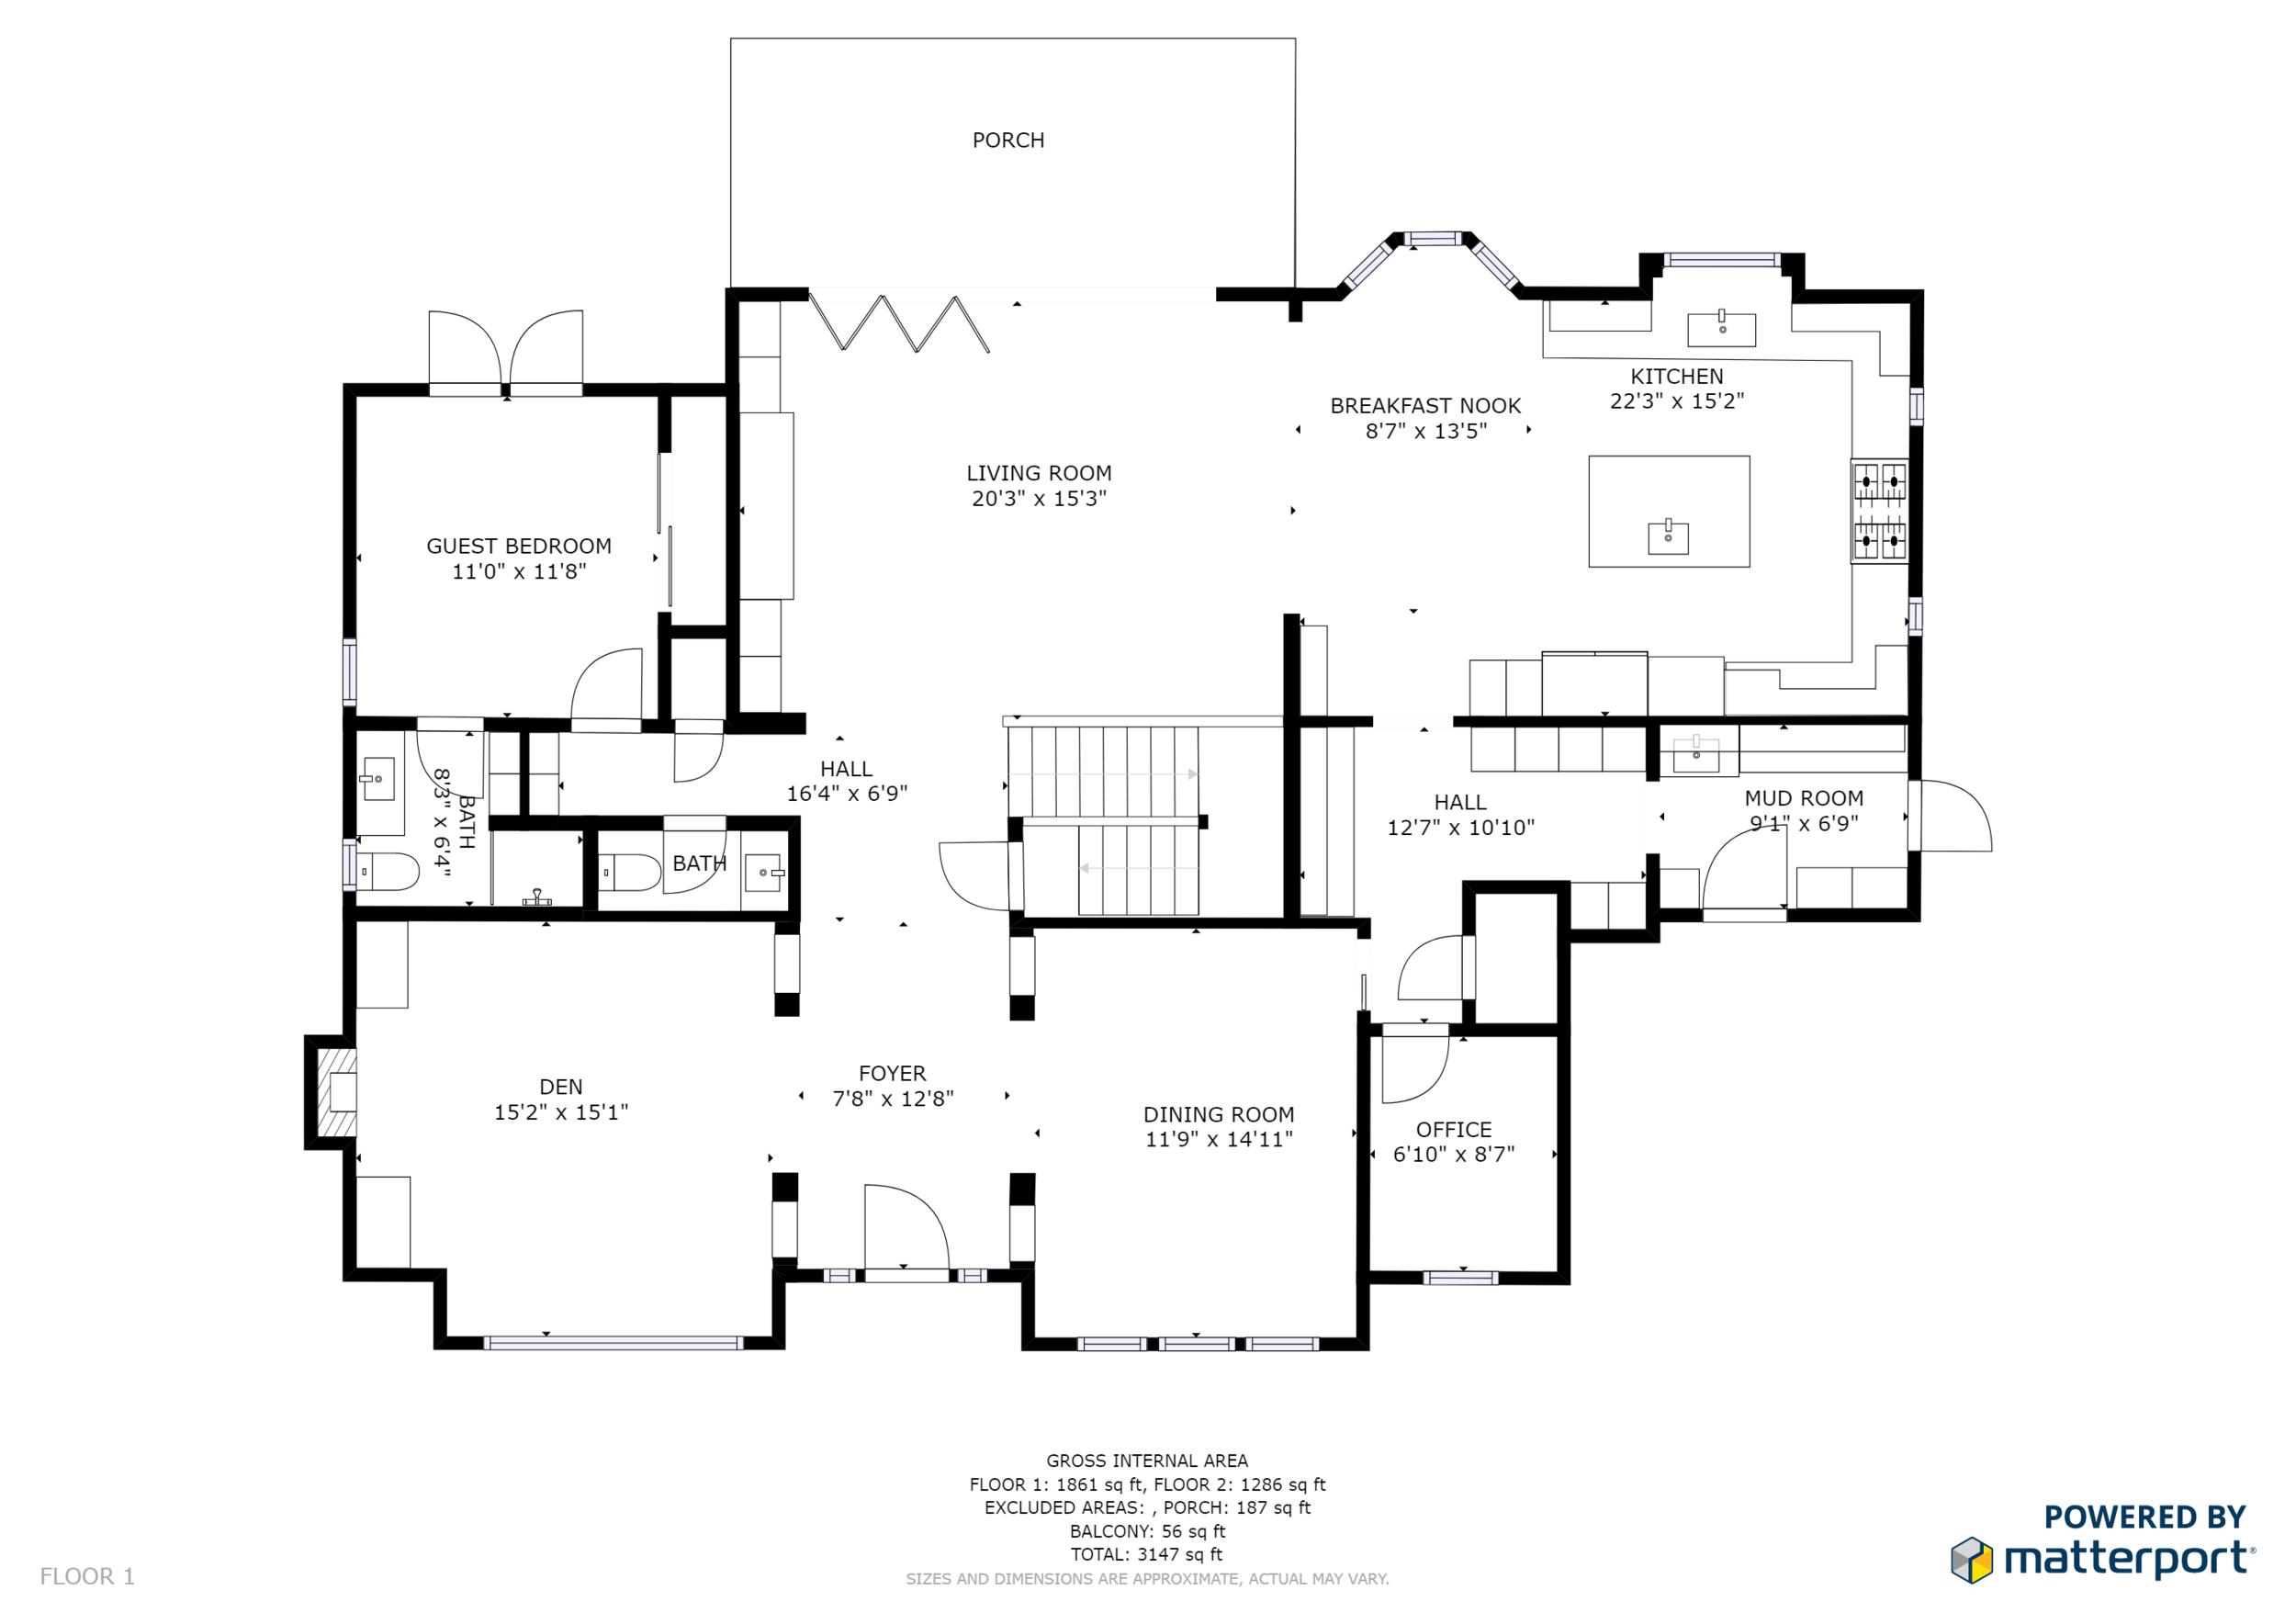 Schematic Floor Plans The Future